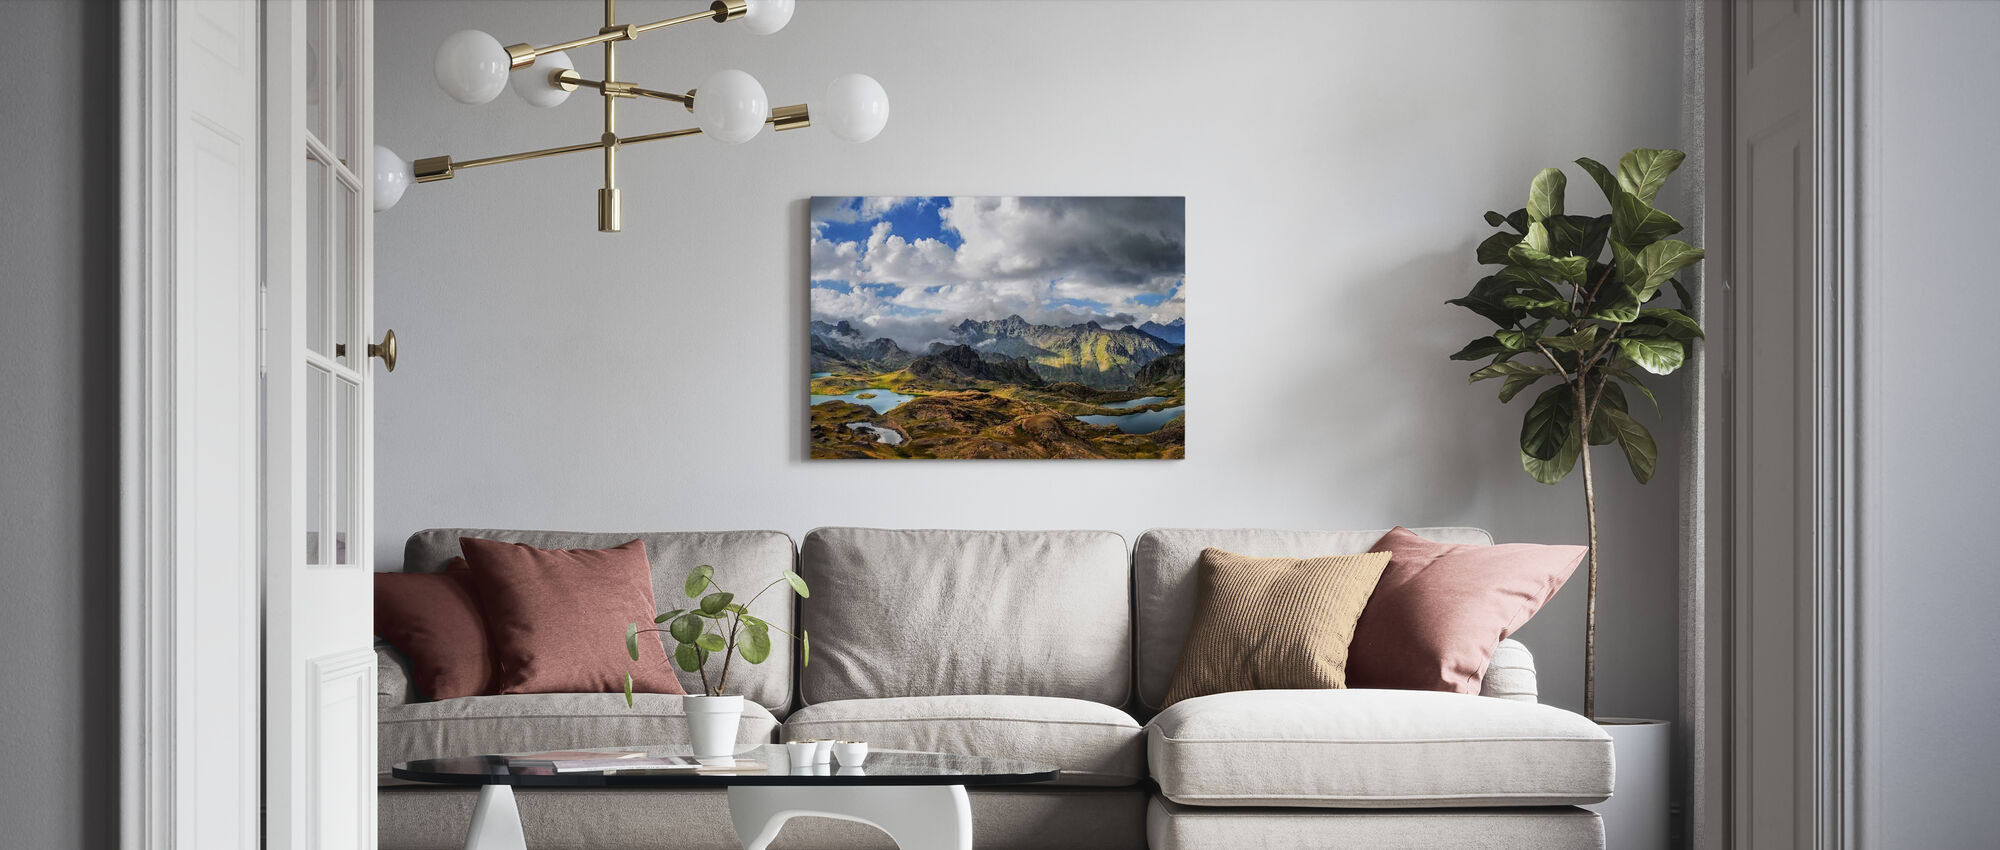 Snow Lake Highlands - Canvas print - Living Room